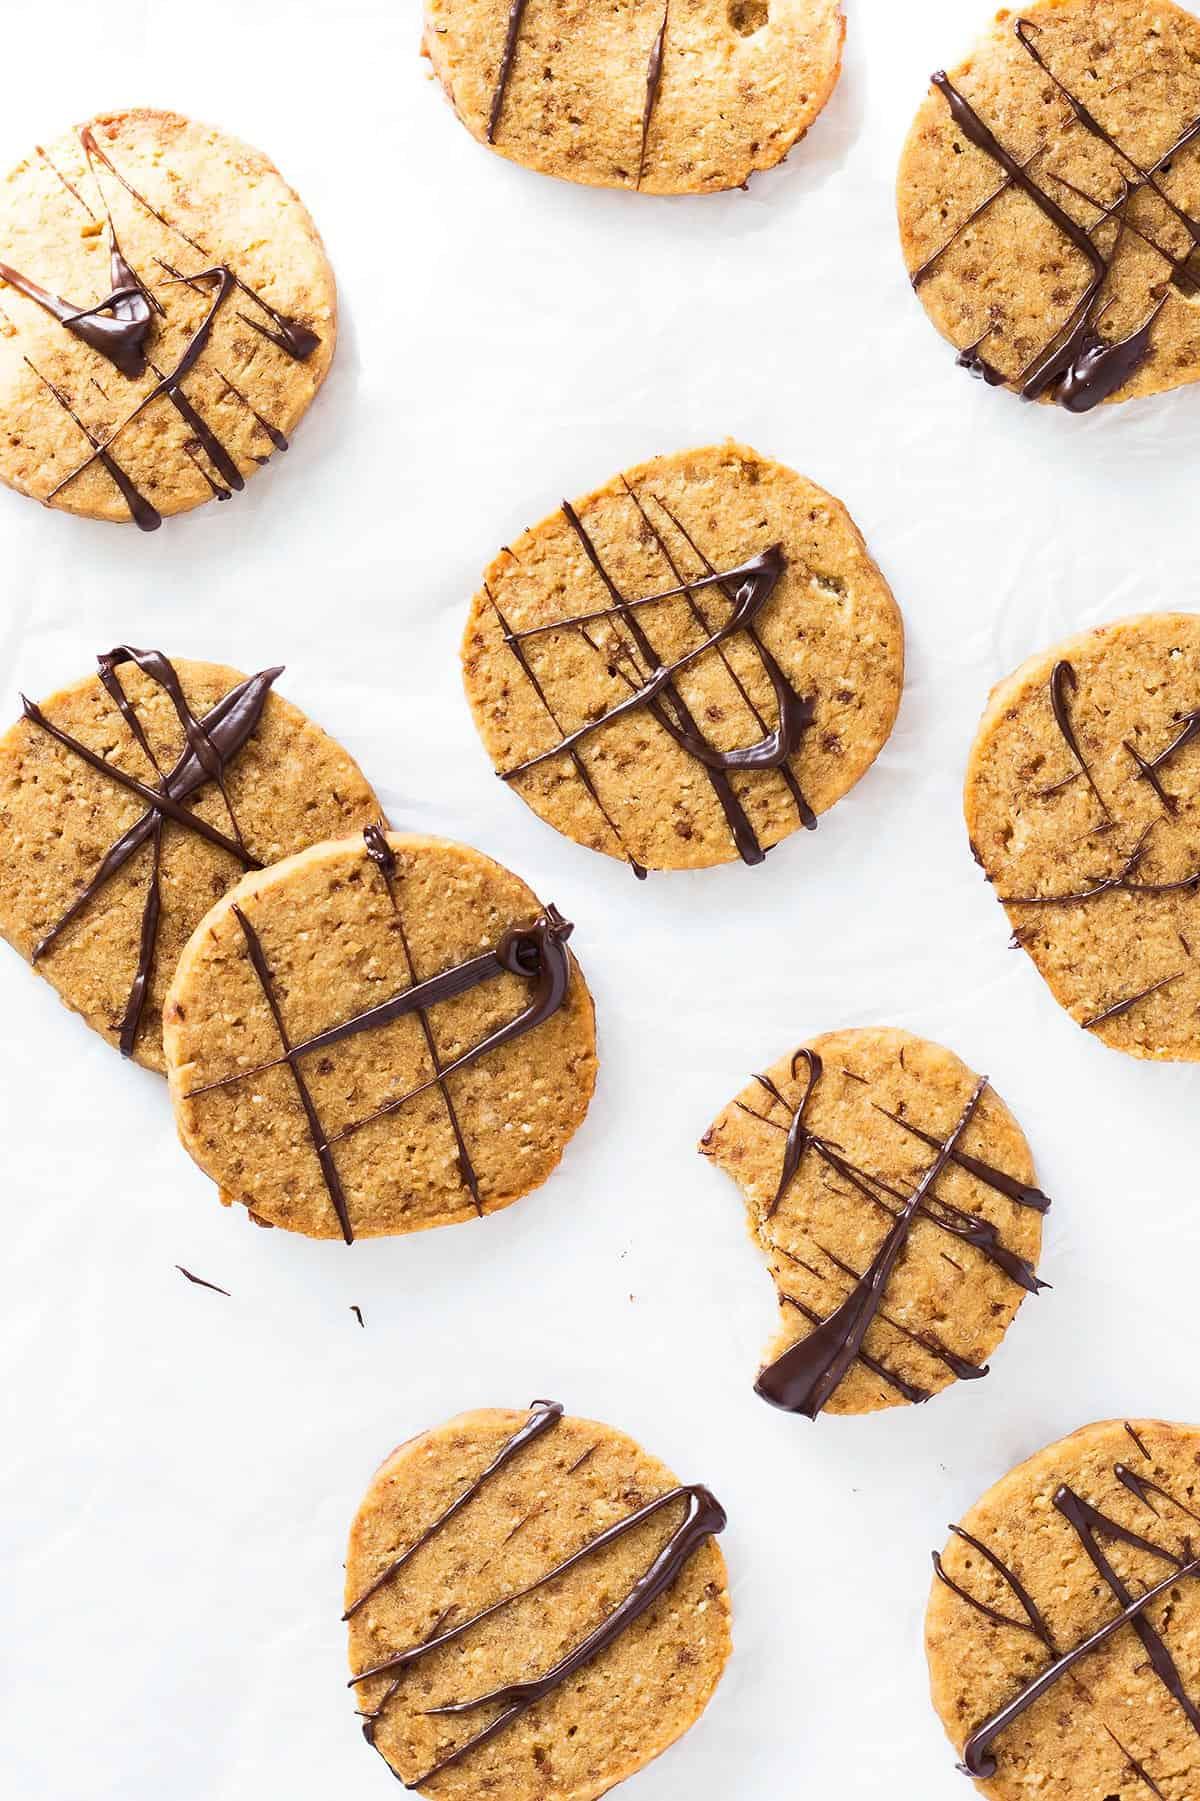 Chocolate-glazed Shortbread Cookies